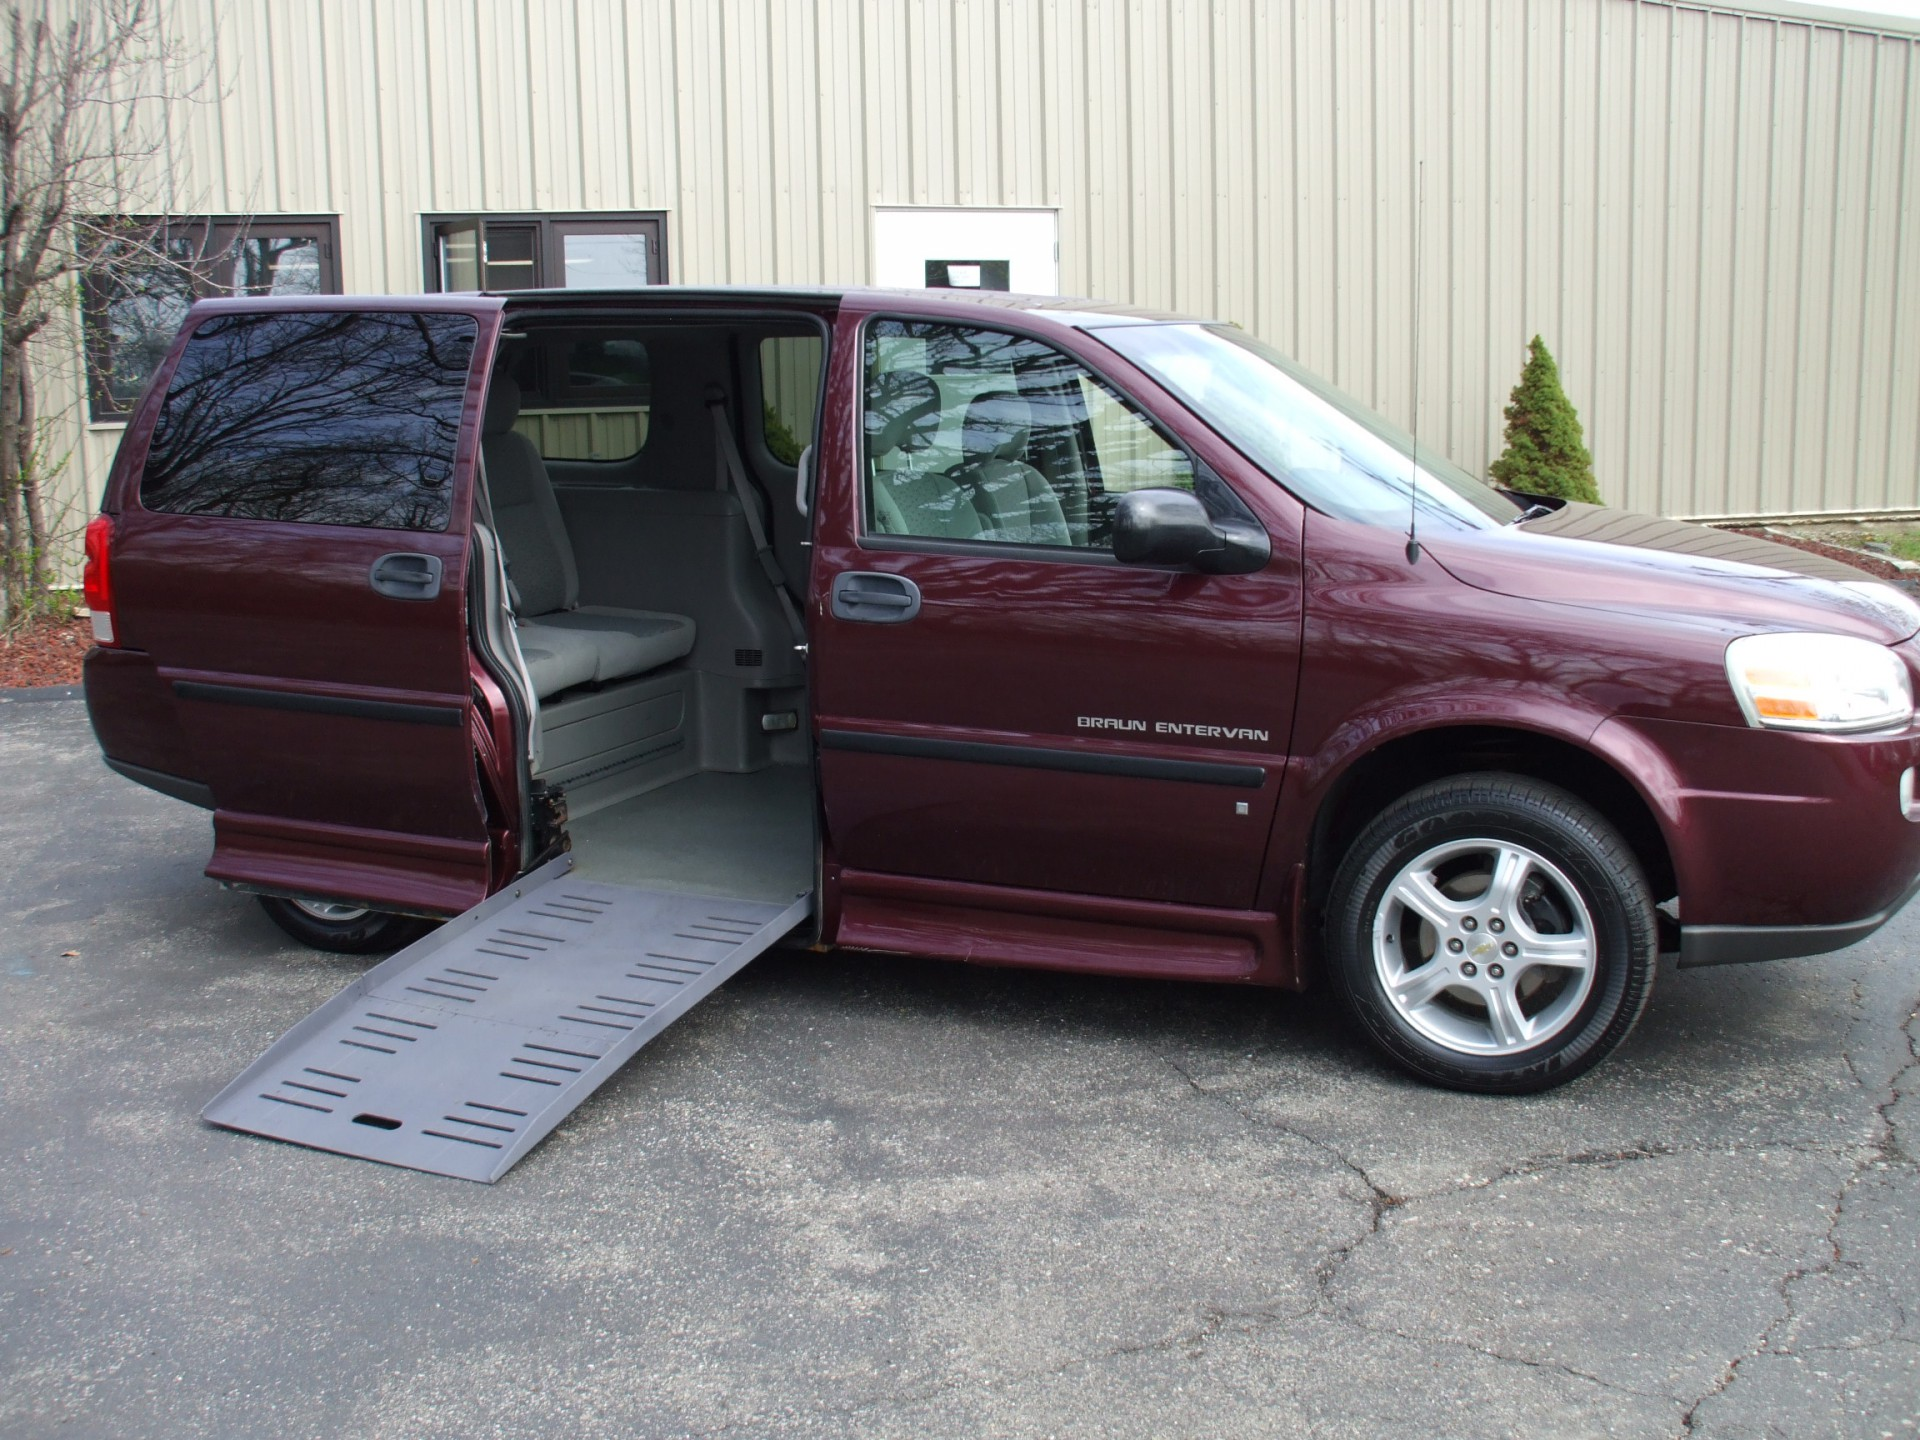 2006 chevrolet uplander stock 242460 wheelchair van for sale gresham driving aids. Black Bedroom Furniture Sets. Home Design Ideas